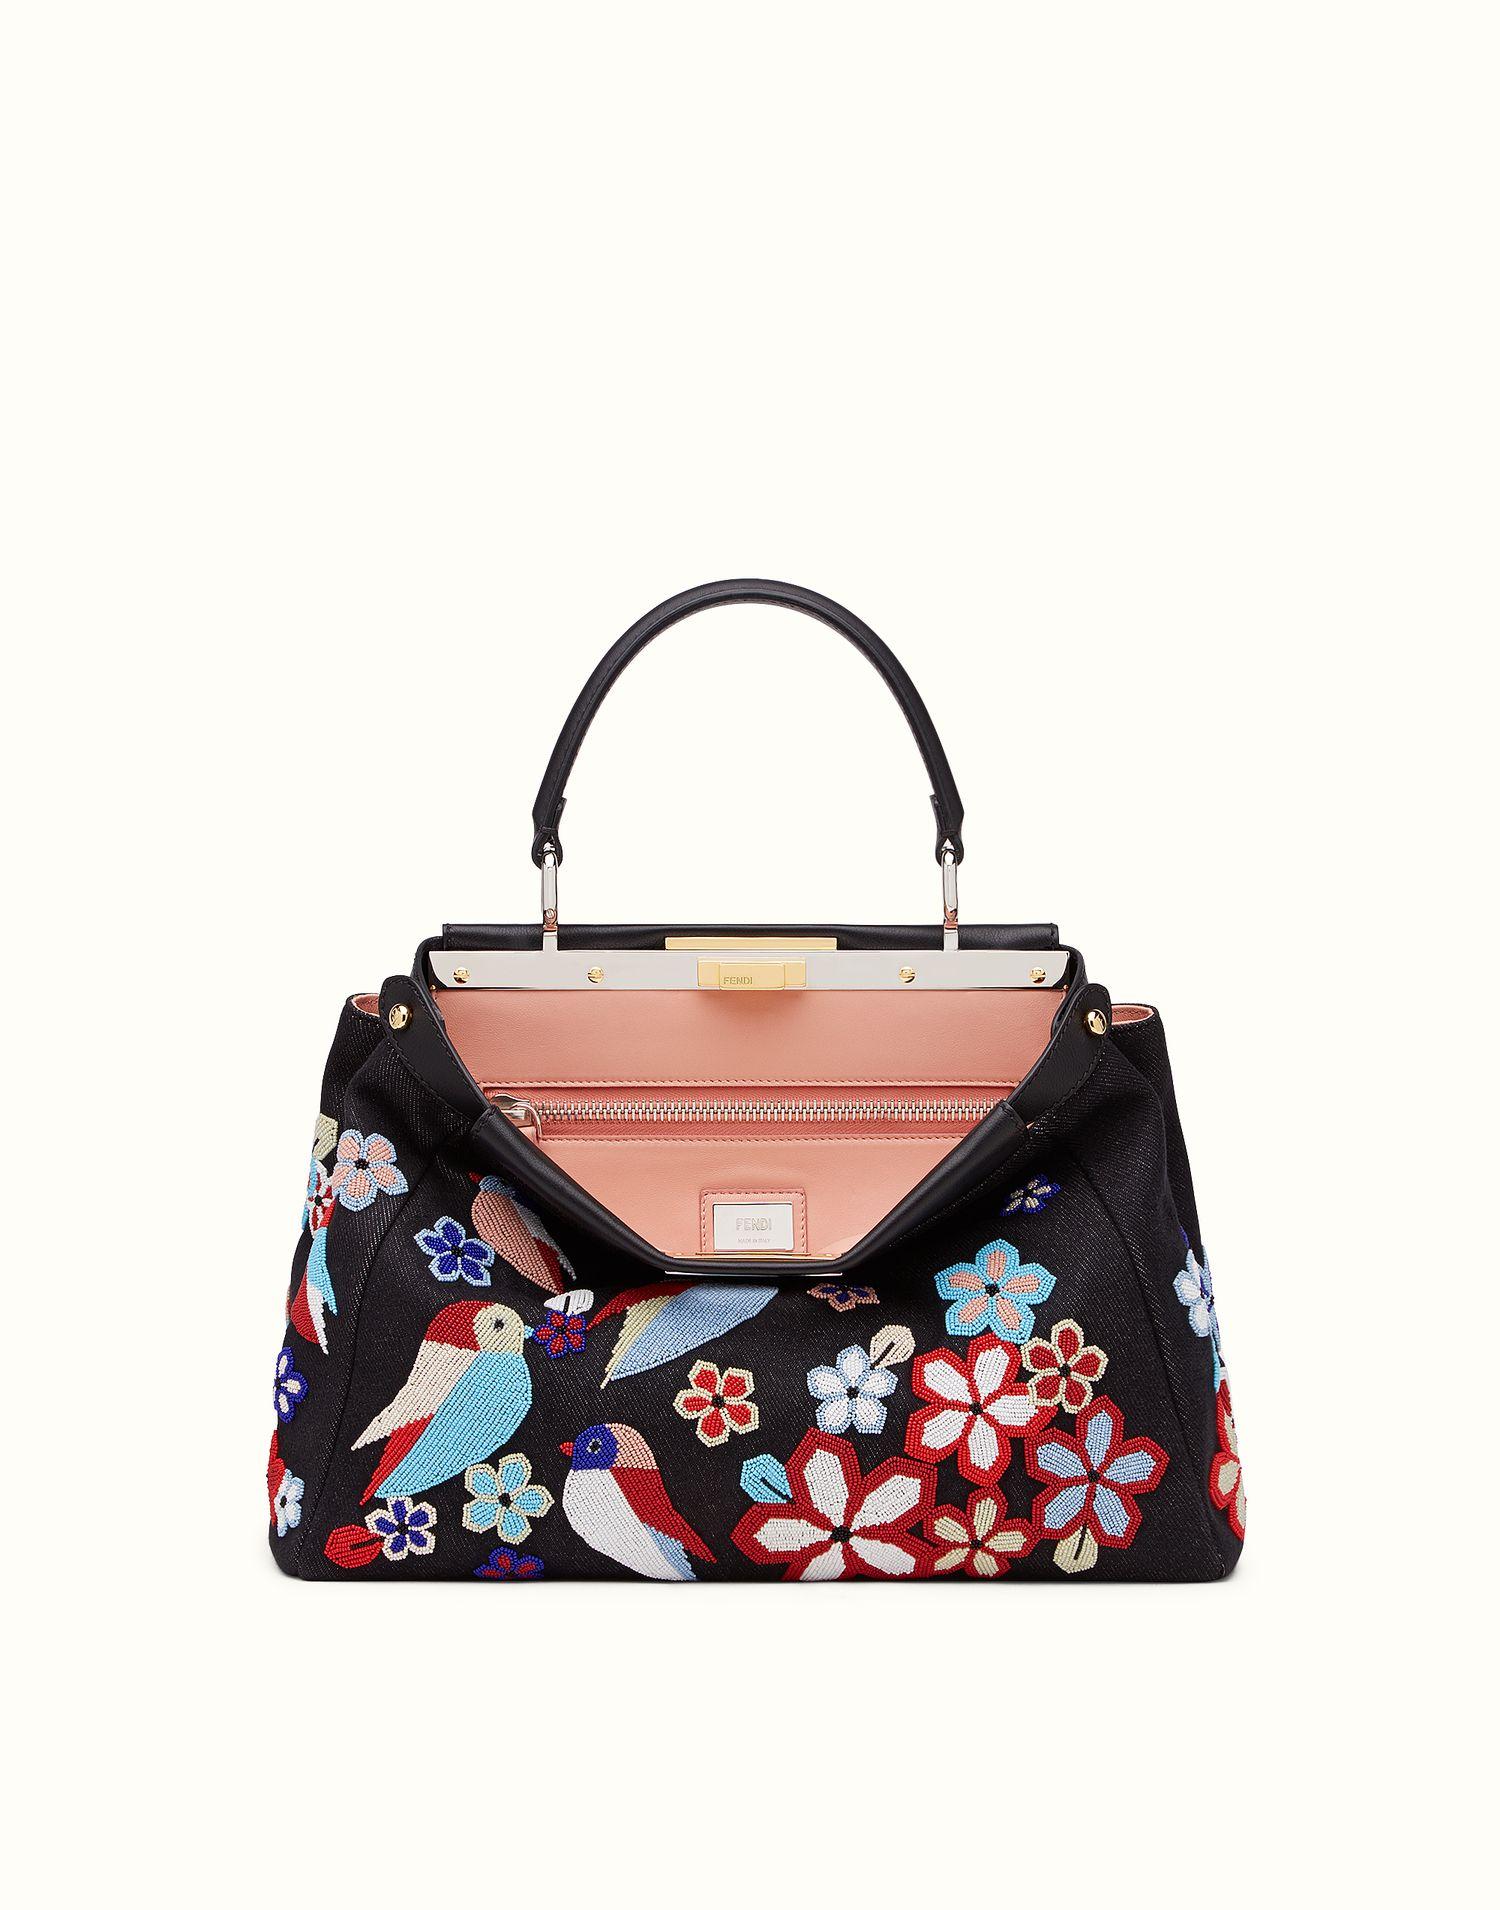 Fendi regular peekaboo handbag with embroidered denim